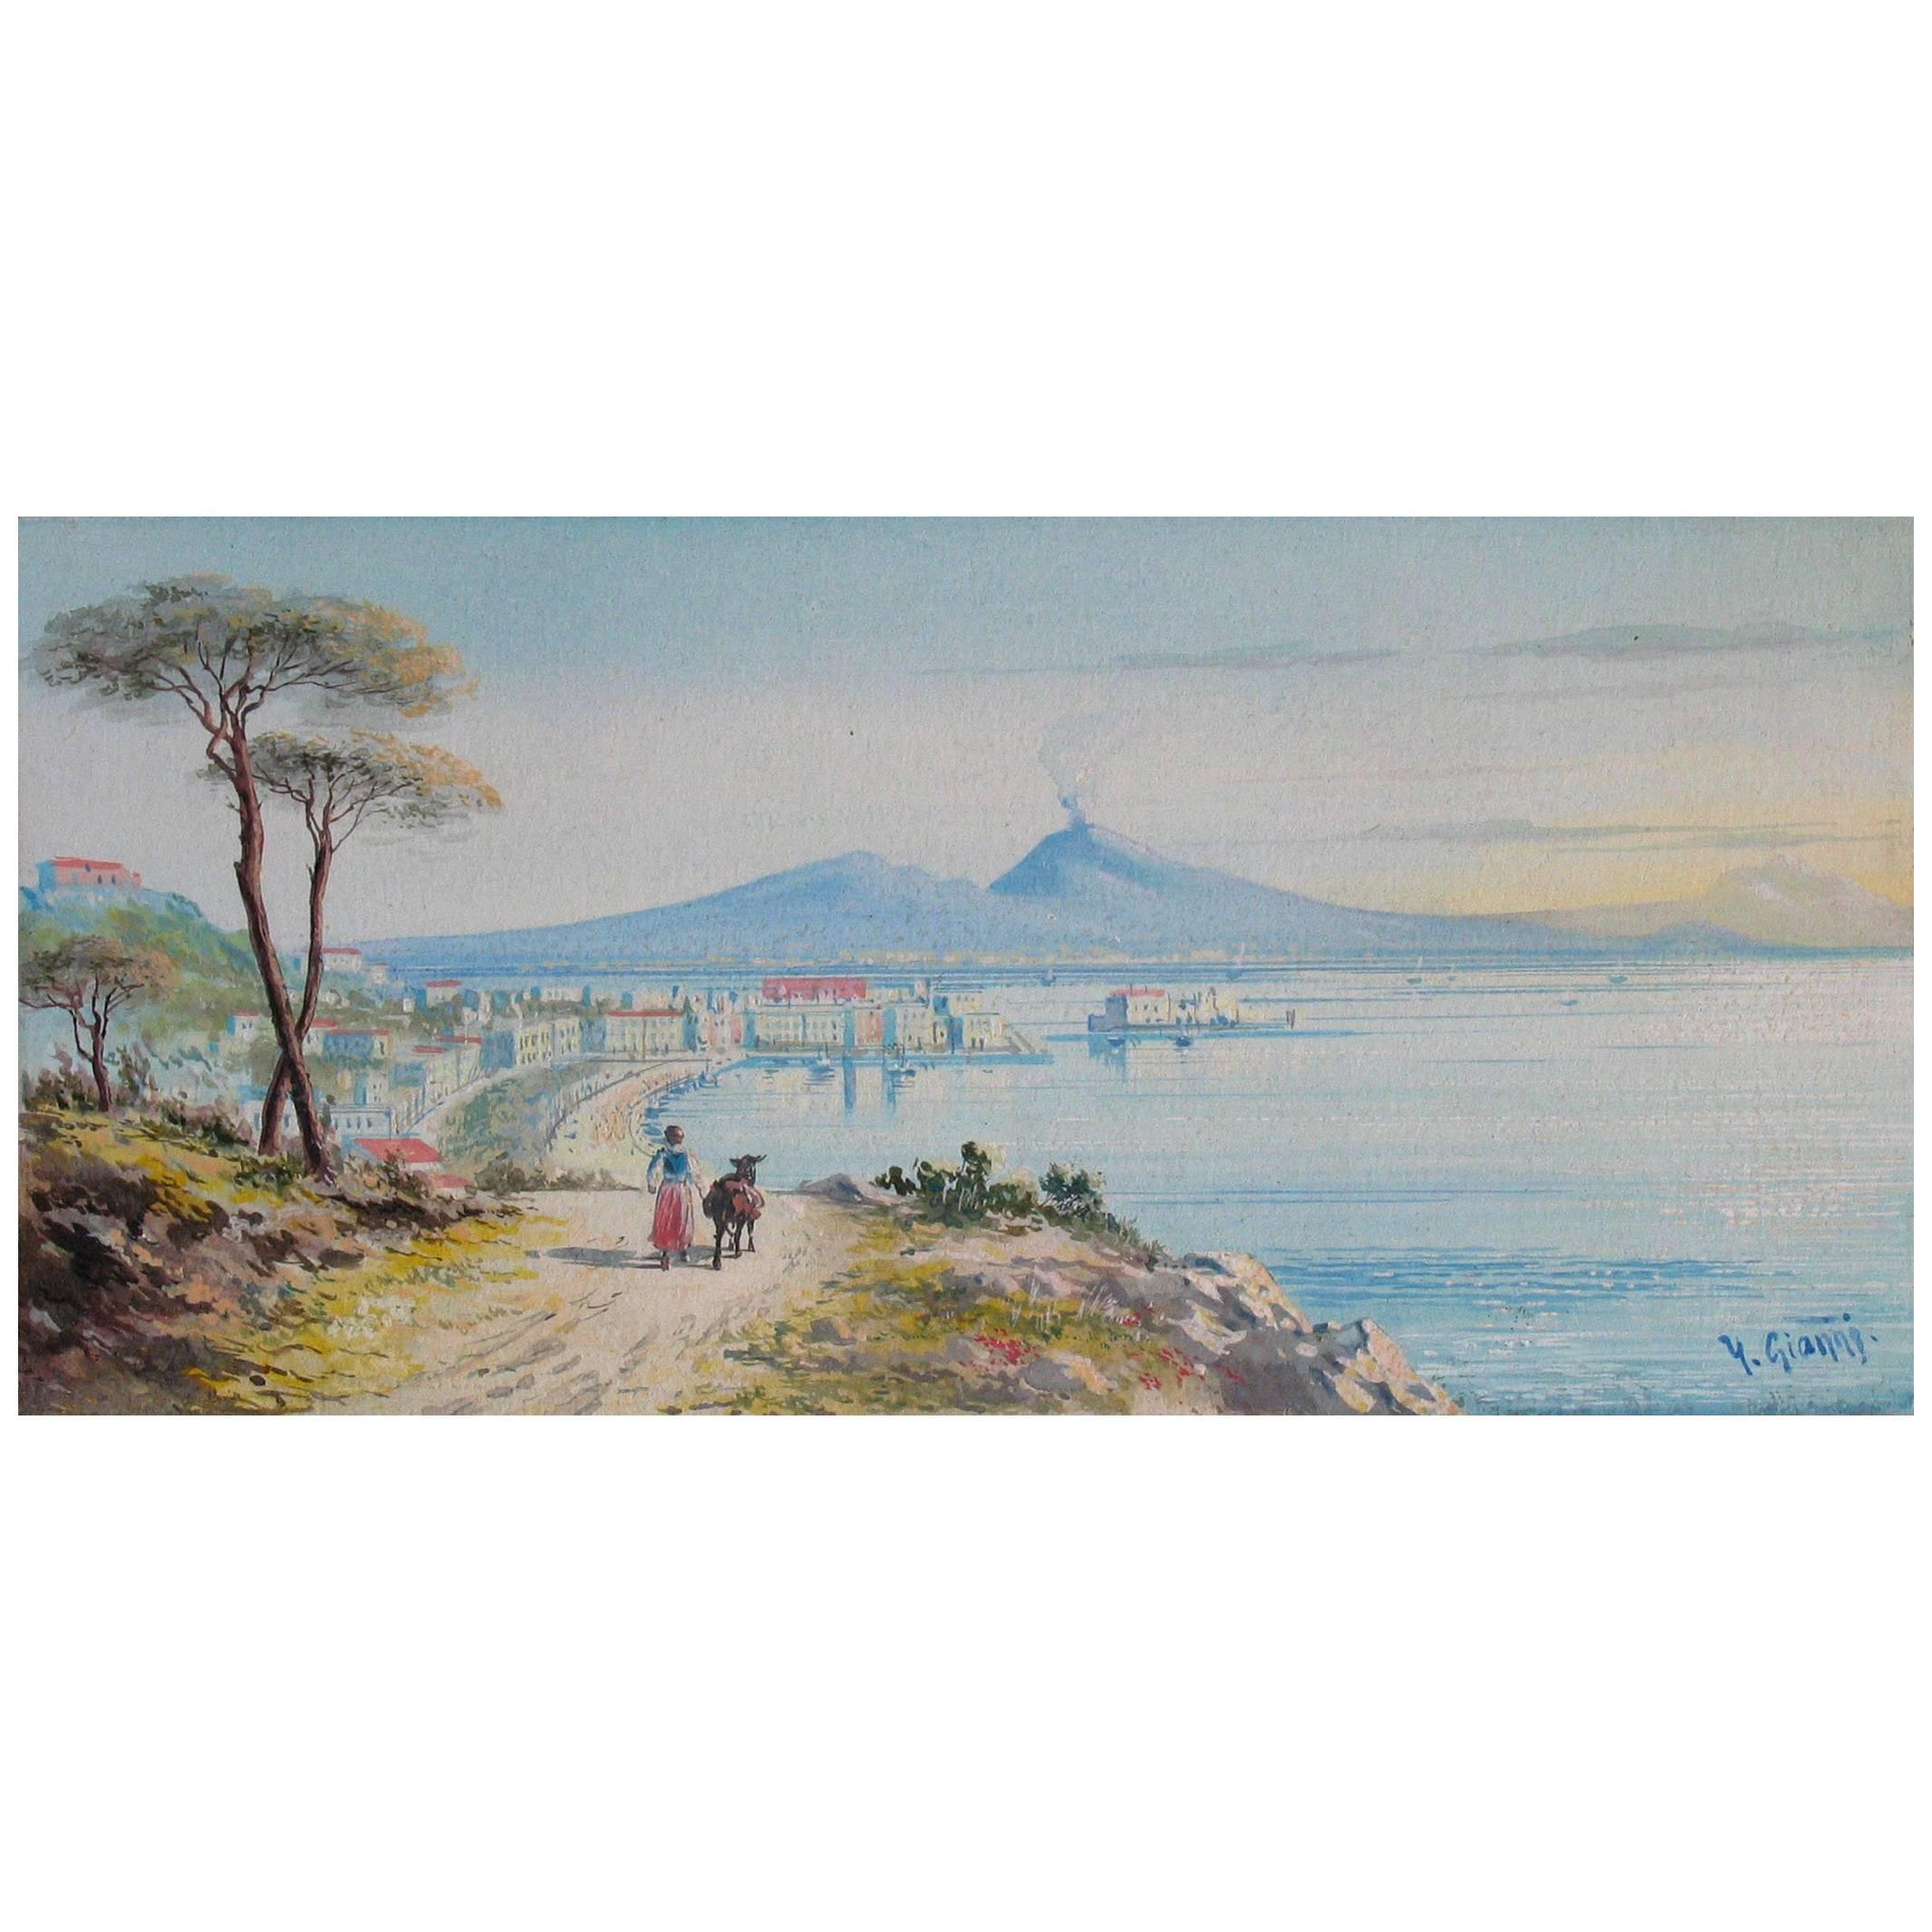 Y. Gianni, Italian the Gulf of Naples, 19th Century